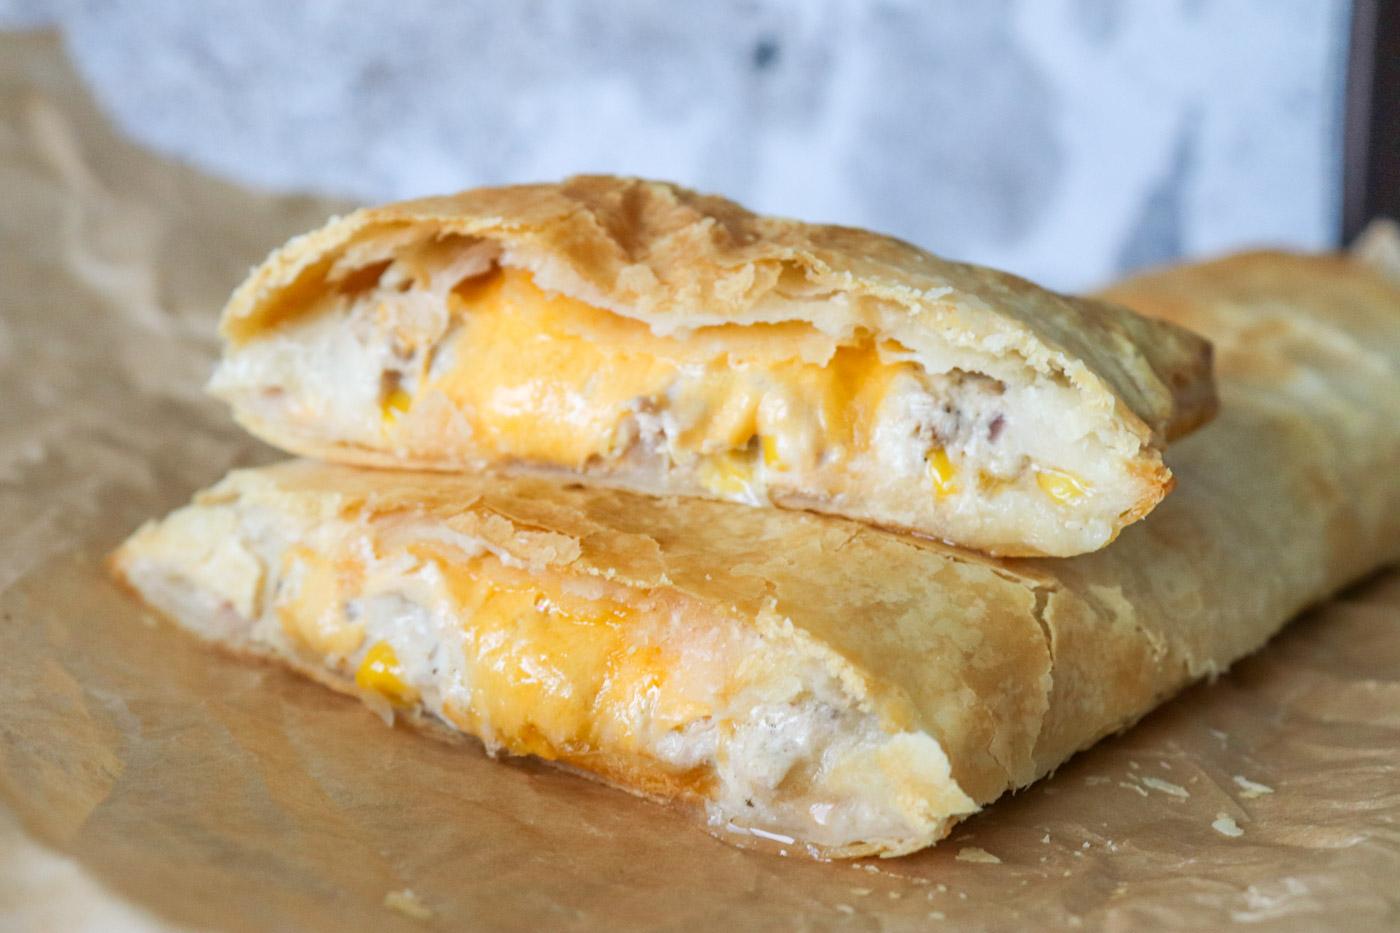 Butterdejsstang Med Cremet Tunsalat Og Ost – Butterdej Med Tun Og Ost